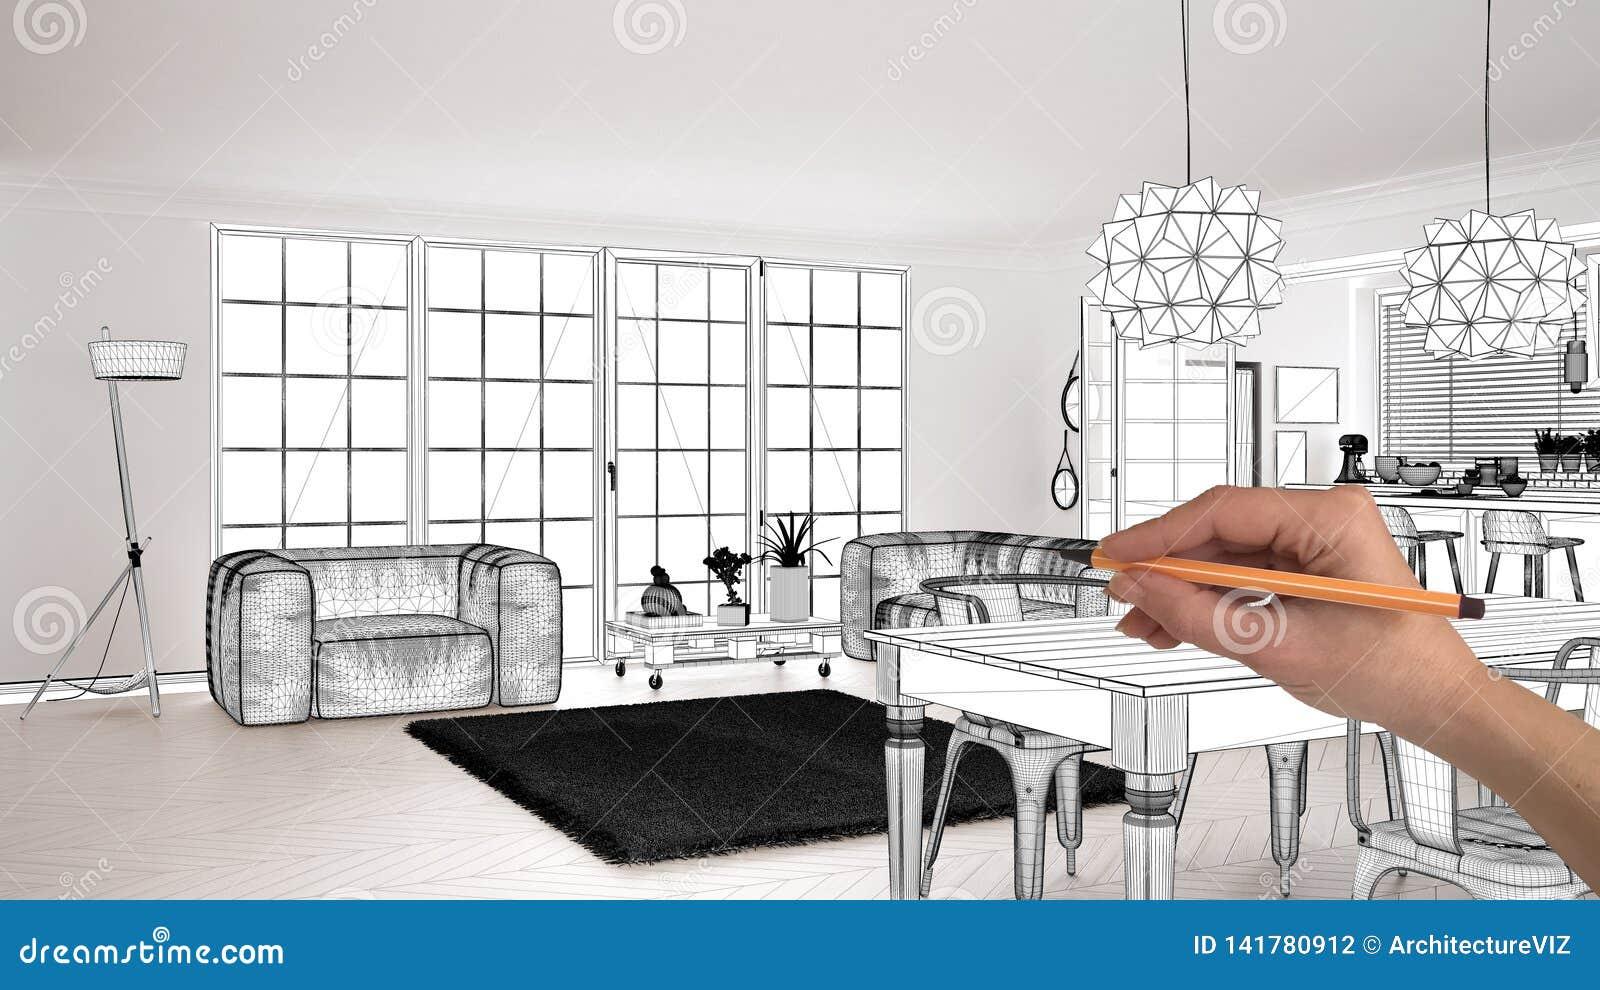 Unfinished Project Under Construction Draft Concept Interior Design Sketch Hand Drawing Scandinavian Living Room Blueprint Stock Photo Image Of Home Designer 141780912